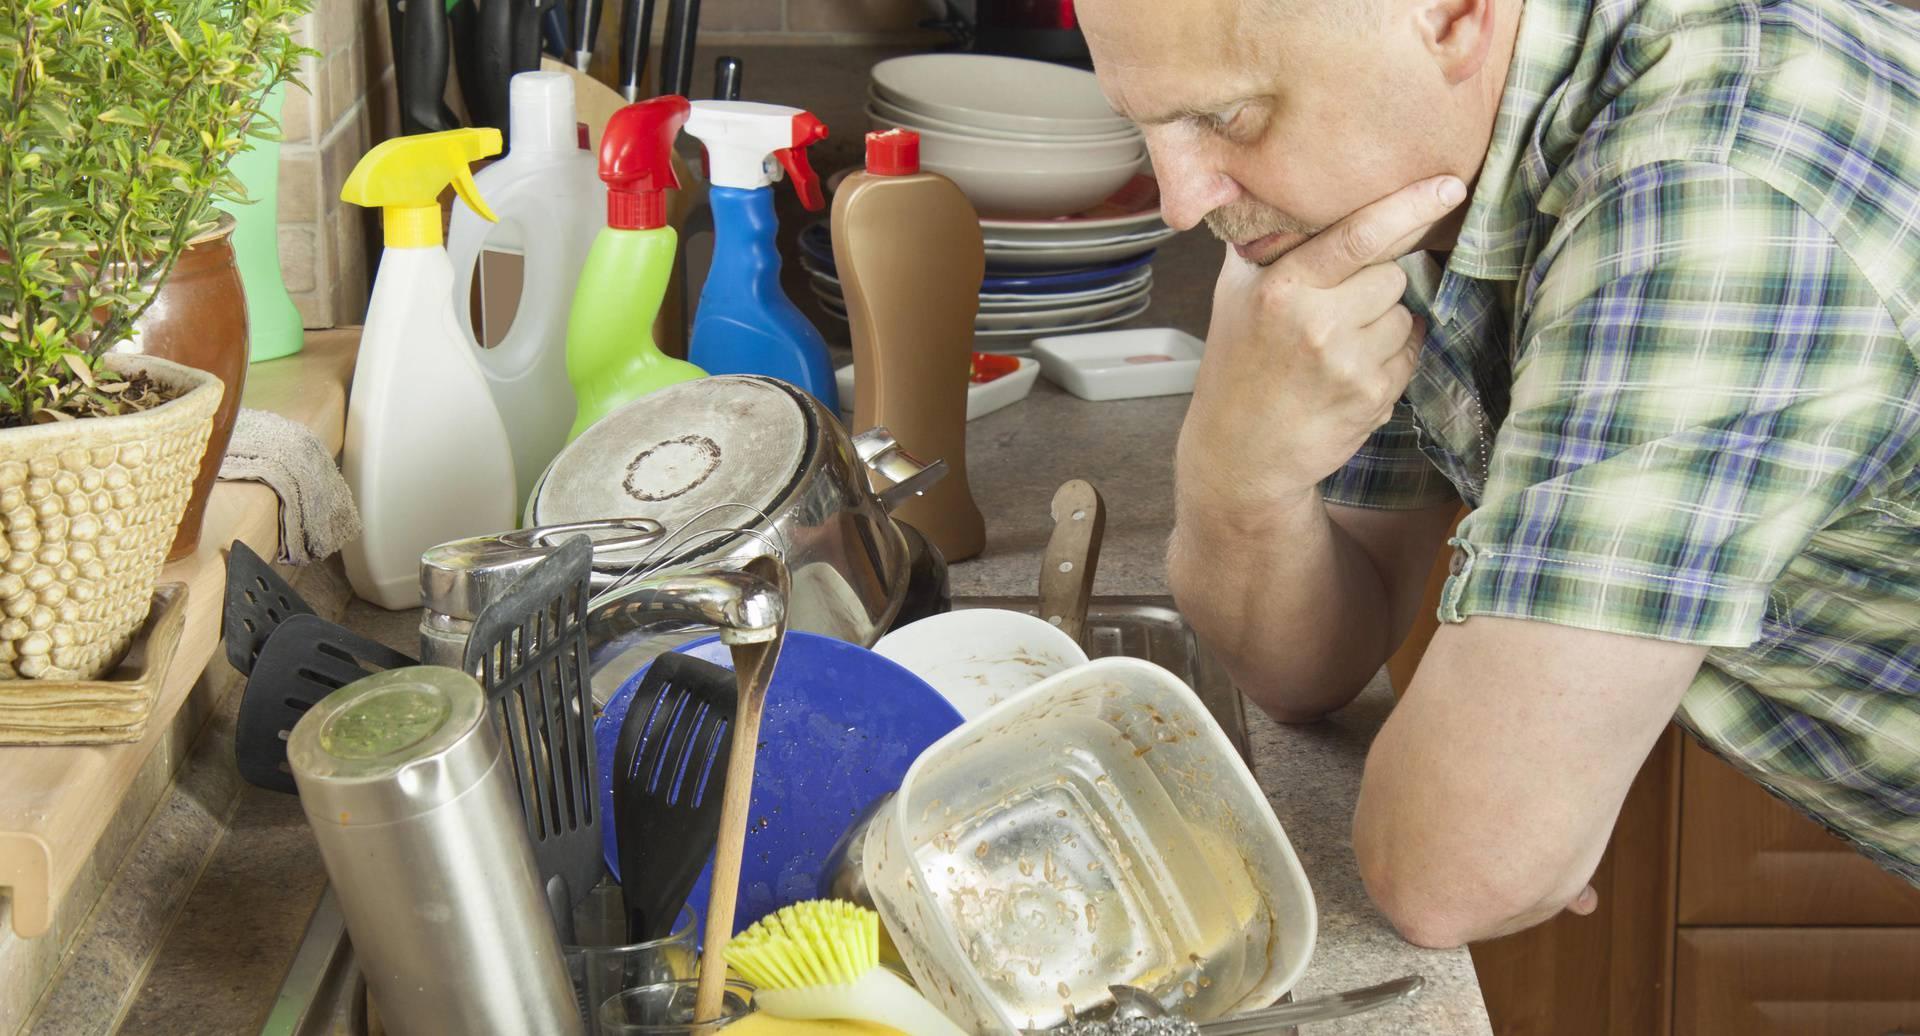 'Bila je van sebe, razvela se od mene zbog suđa kraj sudopera'